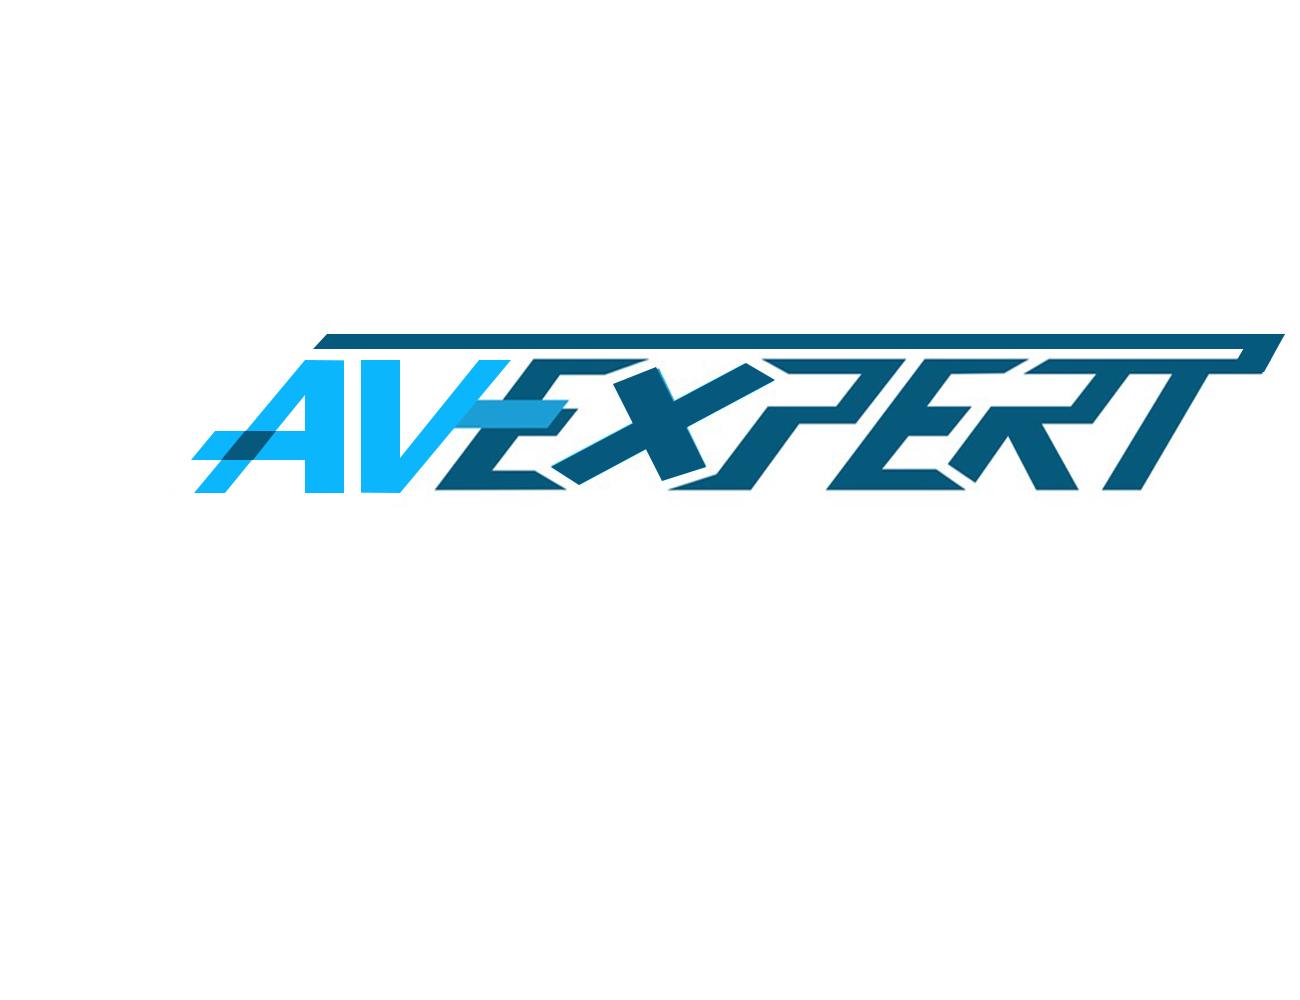 Создание логотипа, фирстиля фото f_5145c622b9e6db11.jpg